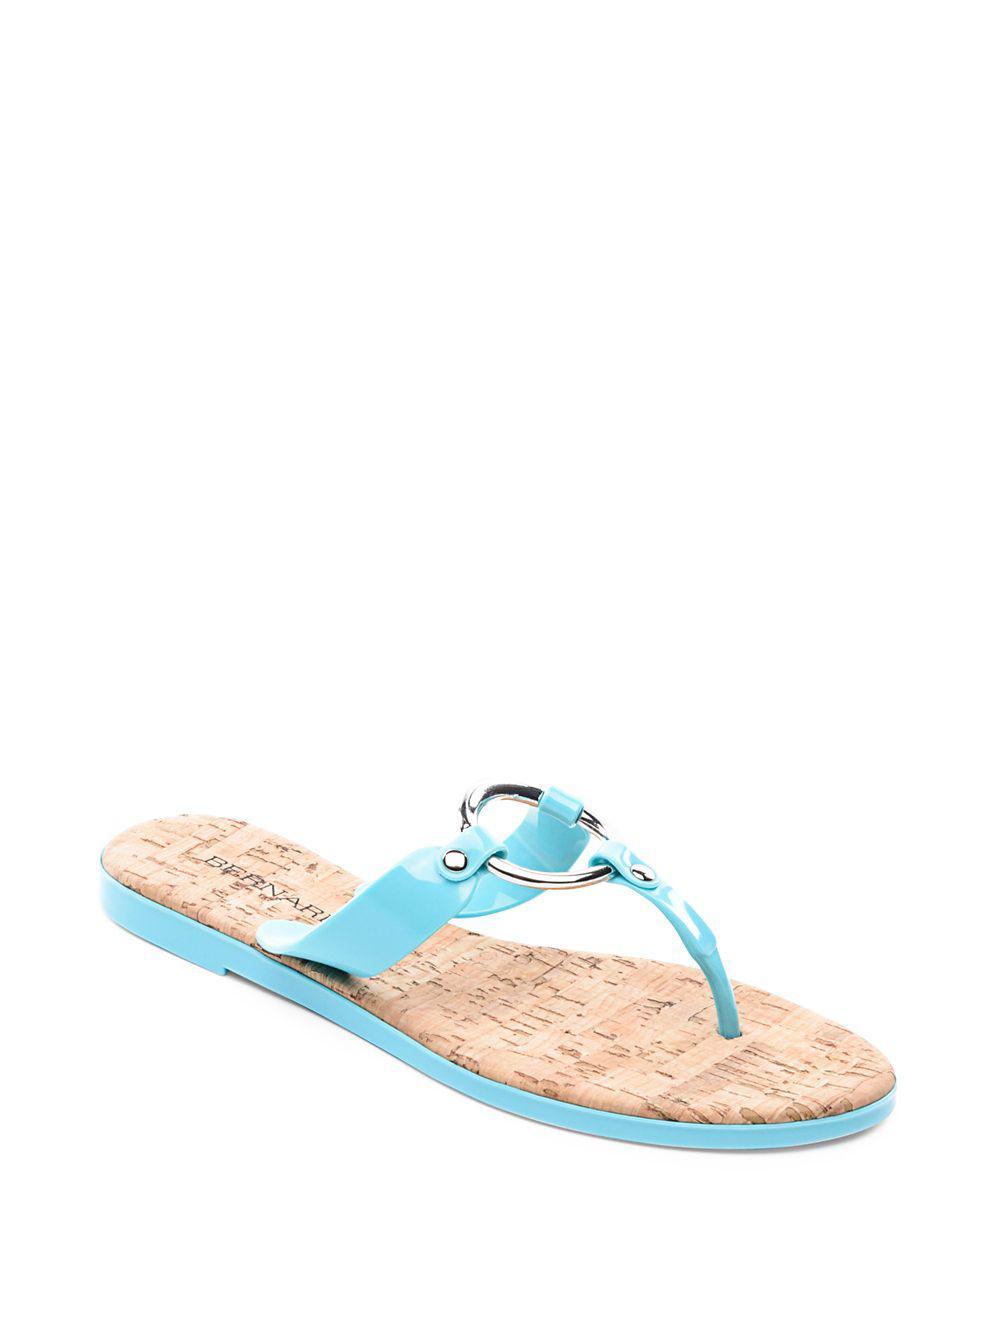 db967fb5cfd Lyst - Bernardo Matrix Jelly Rubber Thong Sandals in Blue